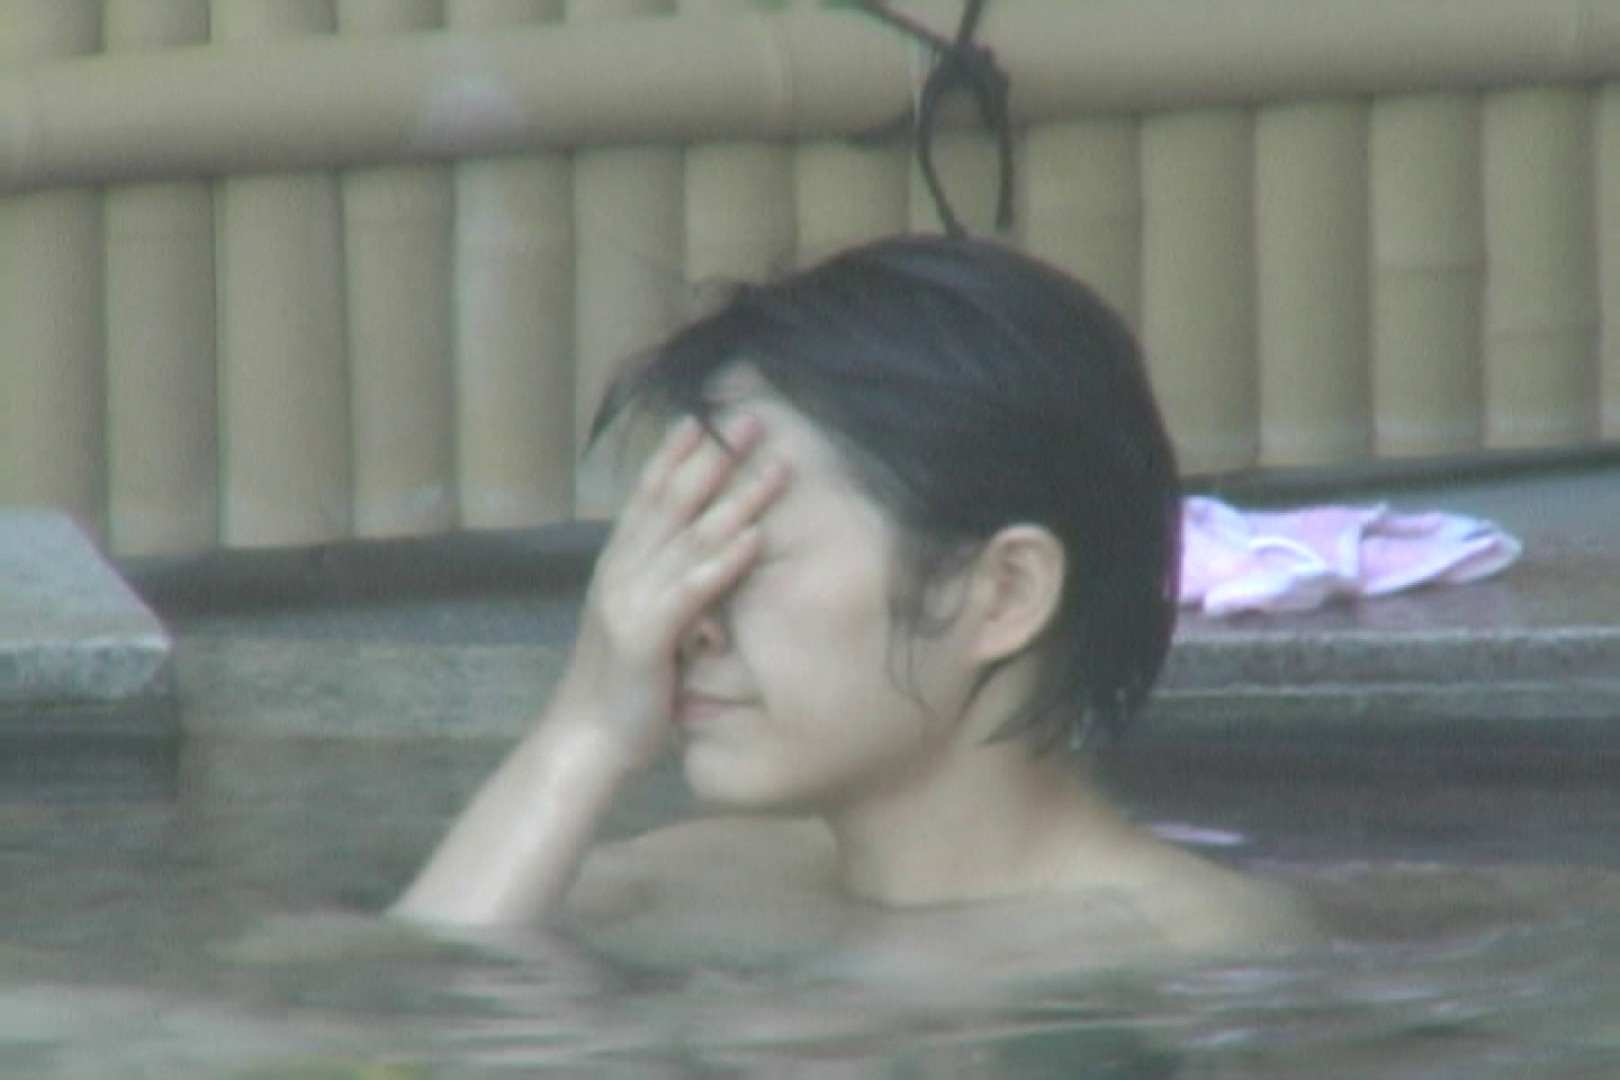 Aquaな露天風呂Vol.116 露天風呂編 | 盗撮シリーズ  107PIX 61